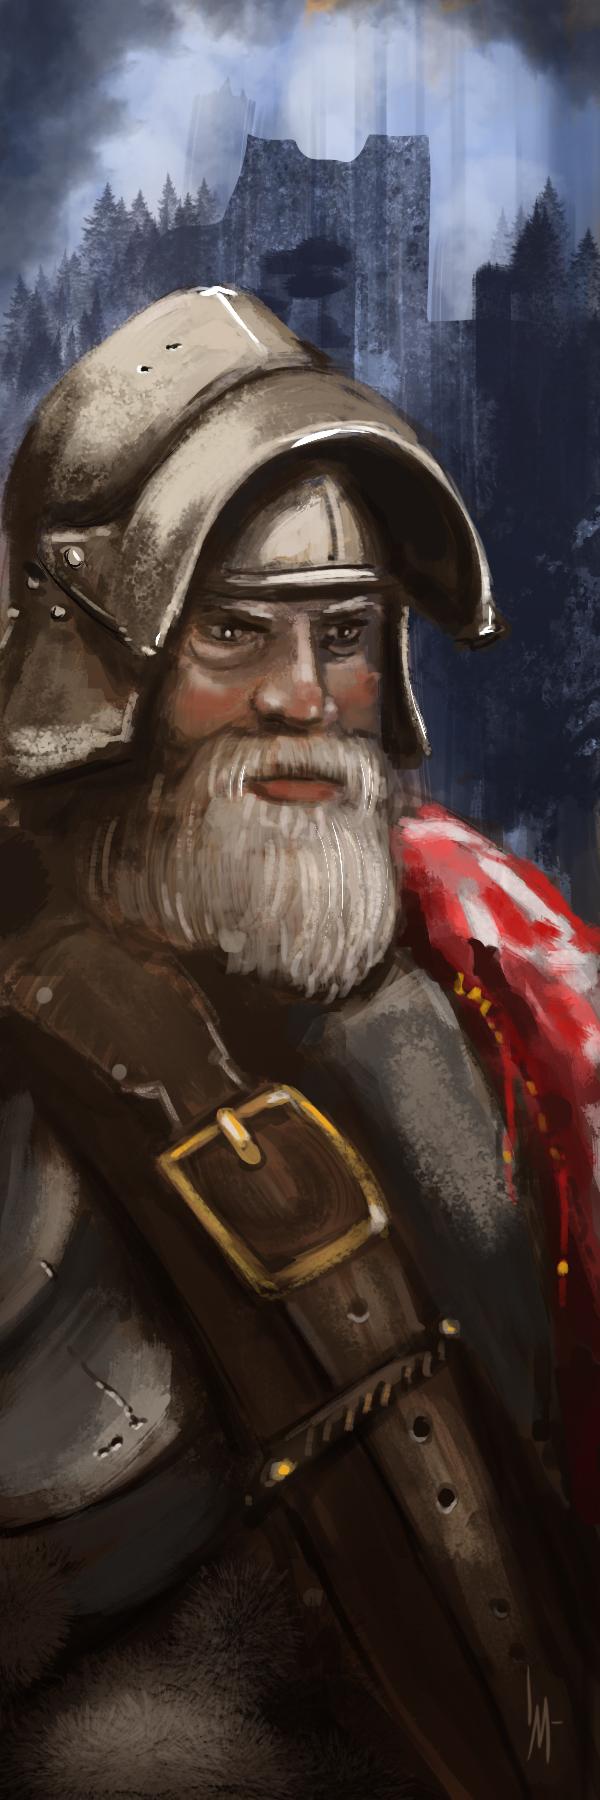 Tregon Firmstone level 3 dwarf